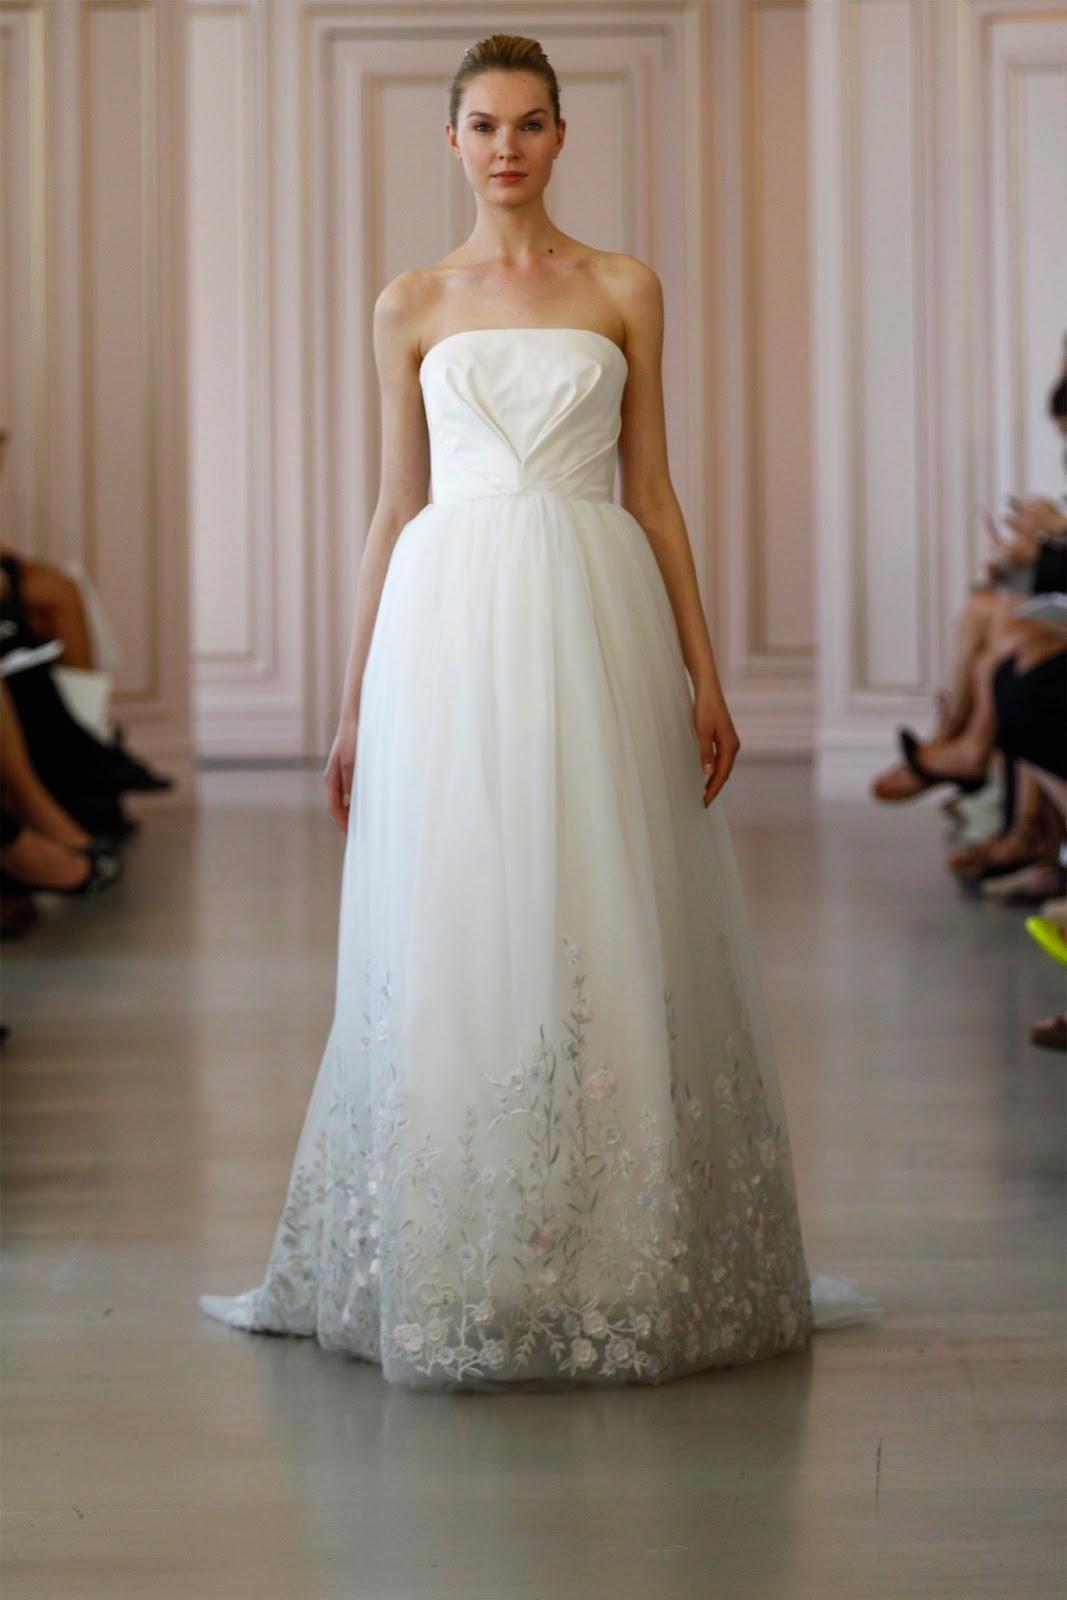 Bridal Wear   New Bridal Dresses For Spring Brides 2016 By Oscar ...